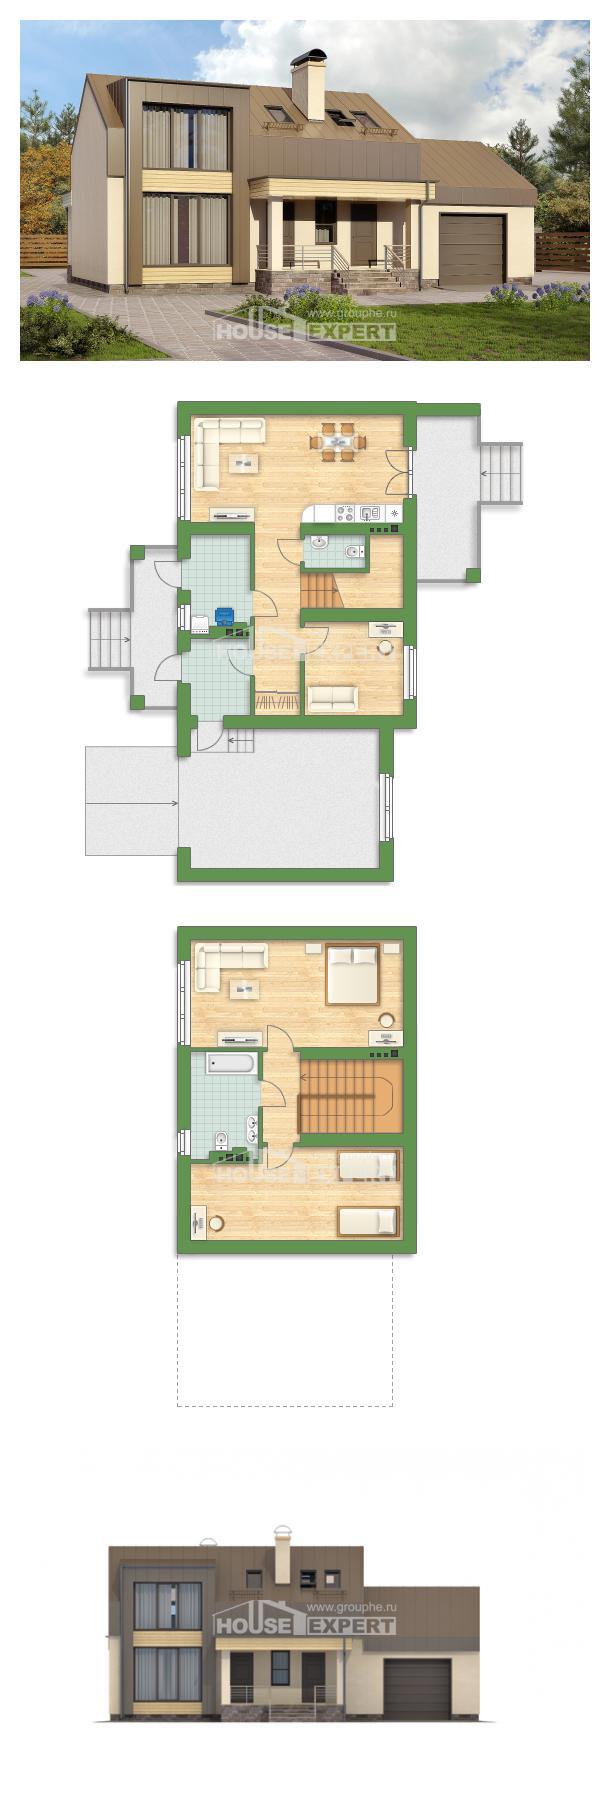 Проект дома 150-015-Л | House Expert